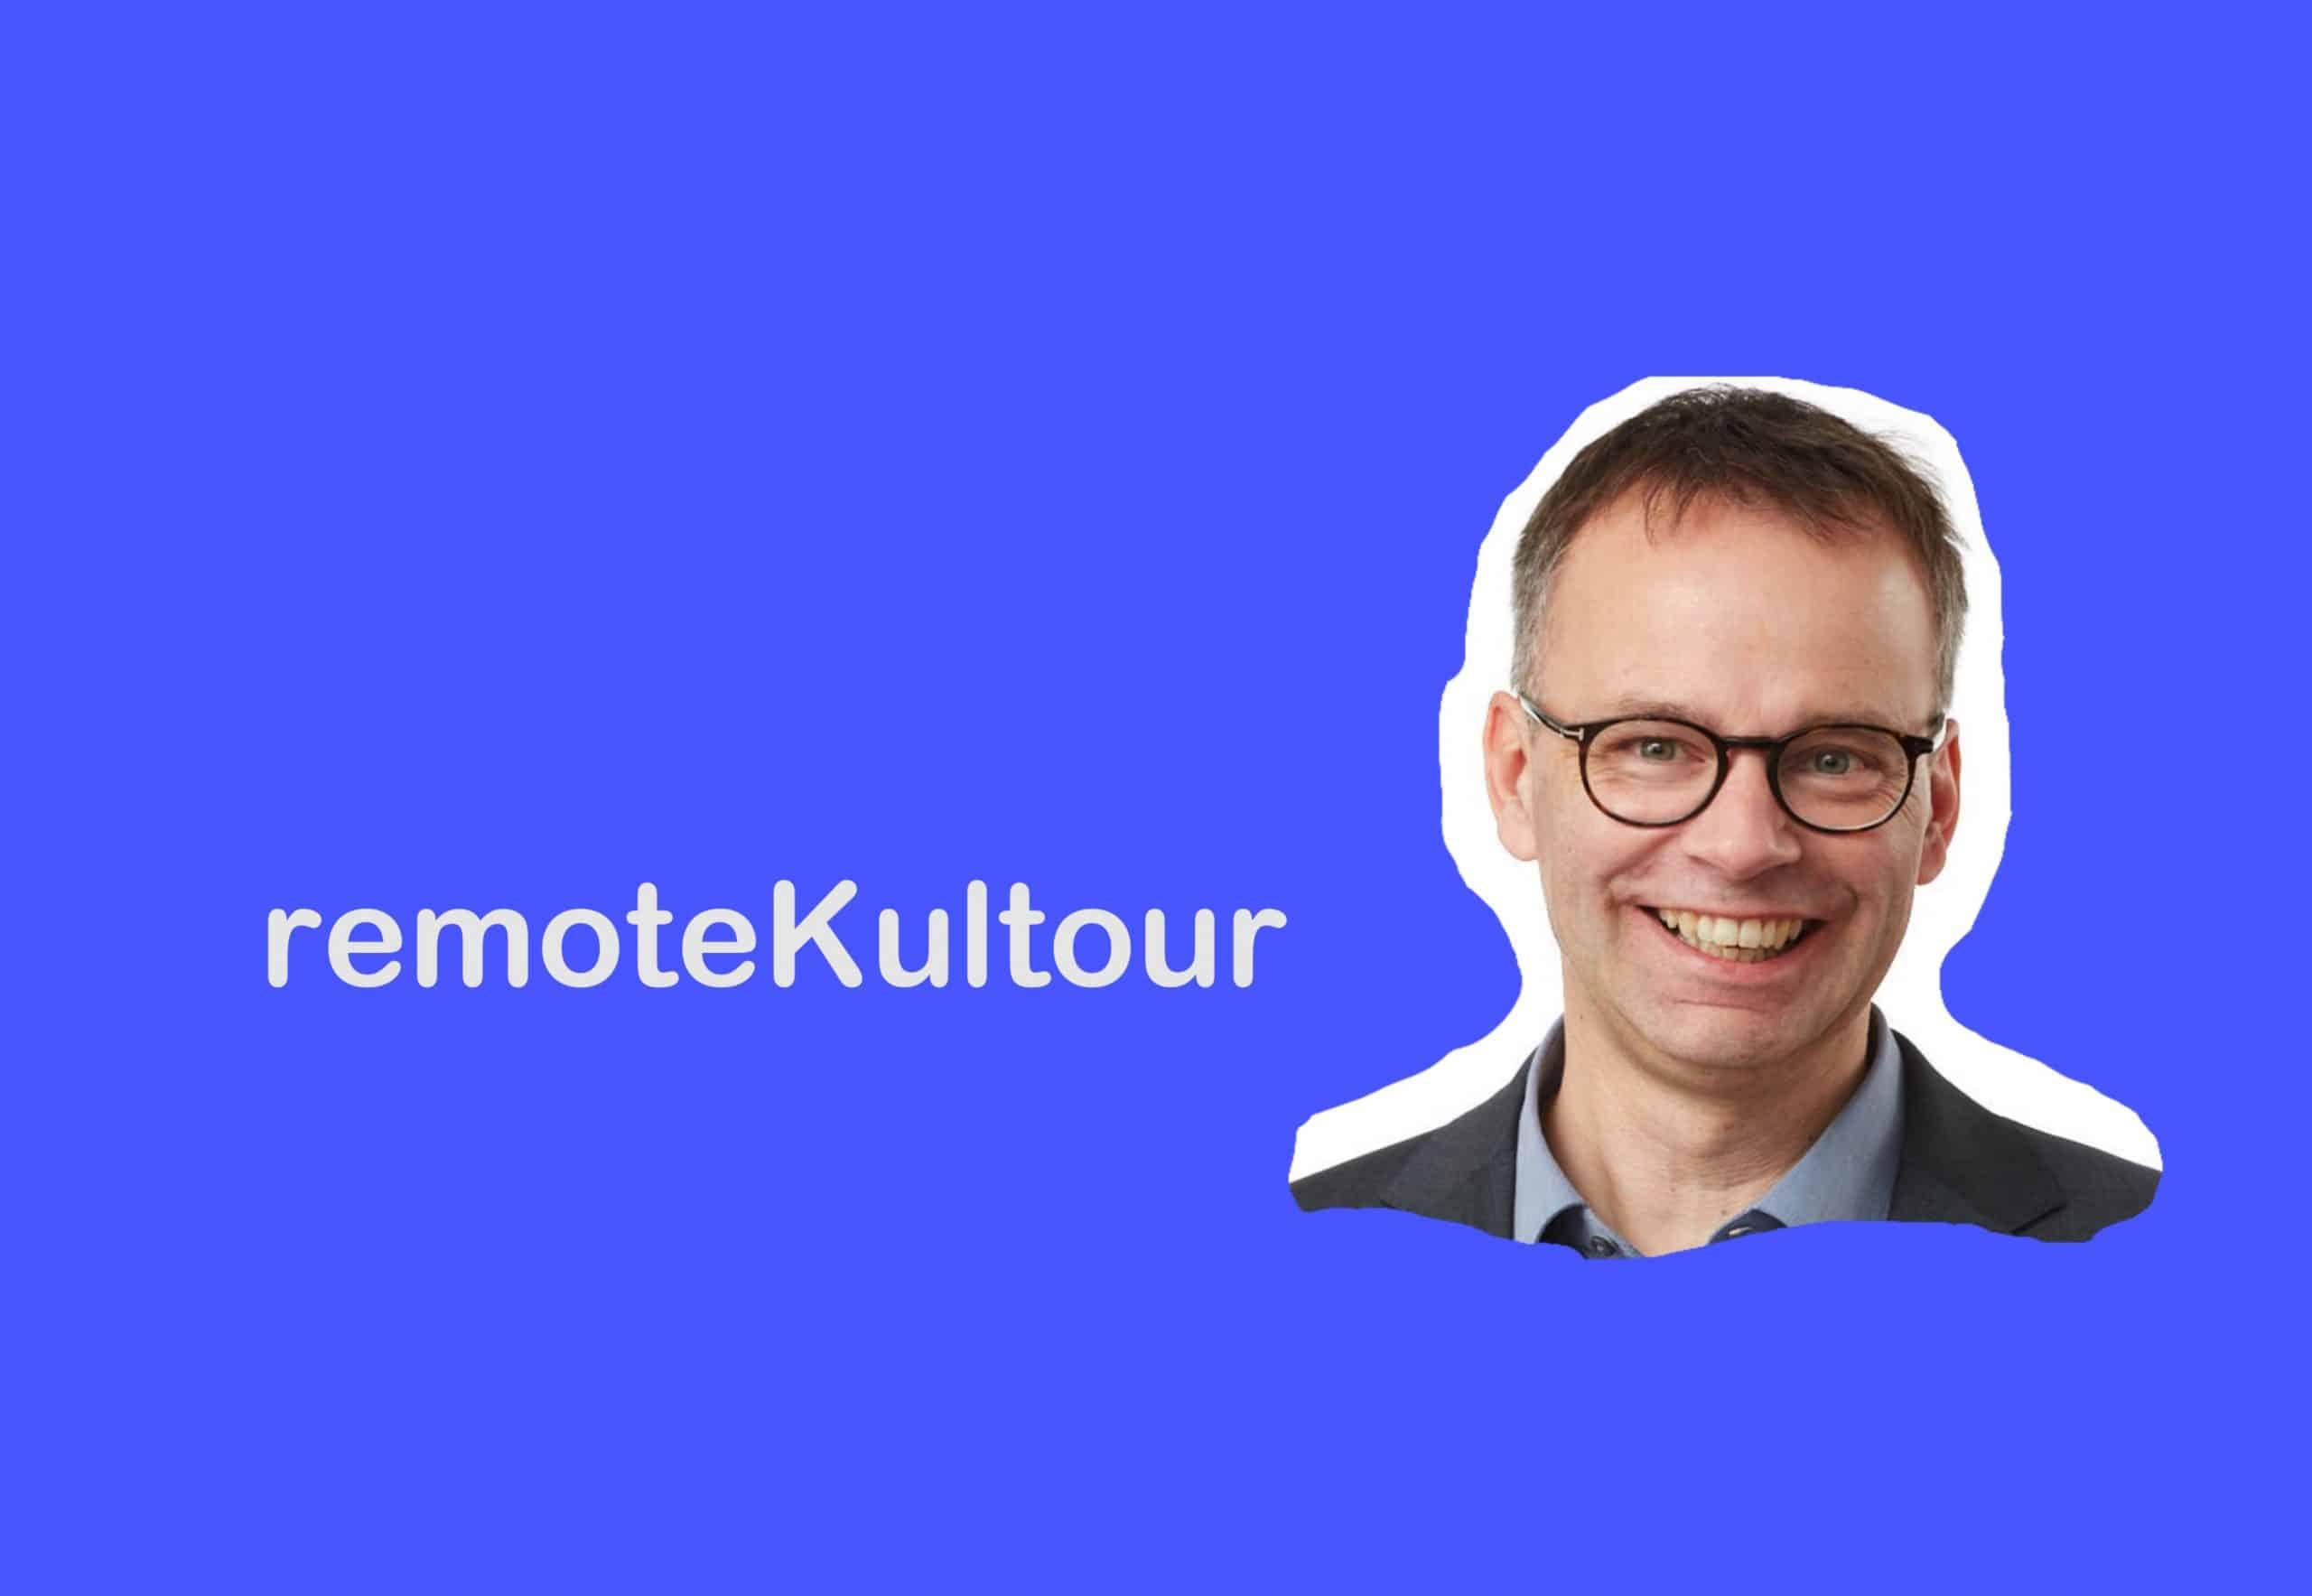 remoteKultour